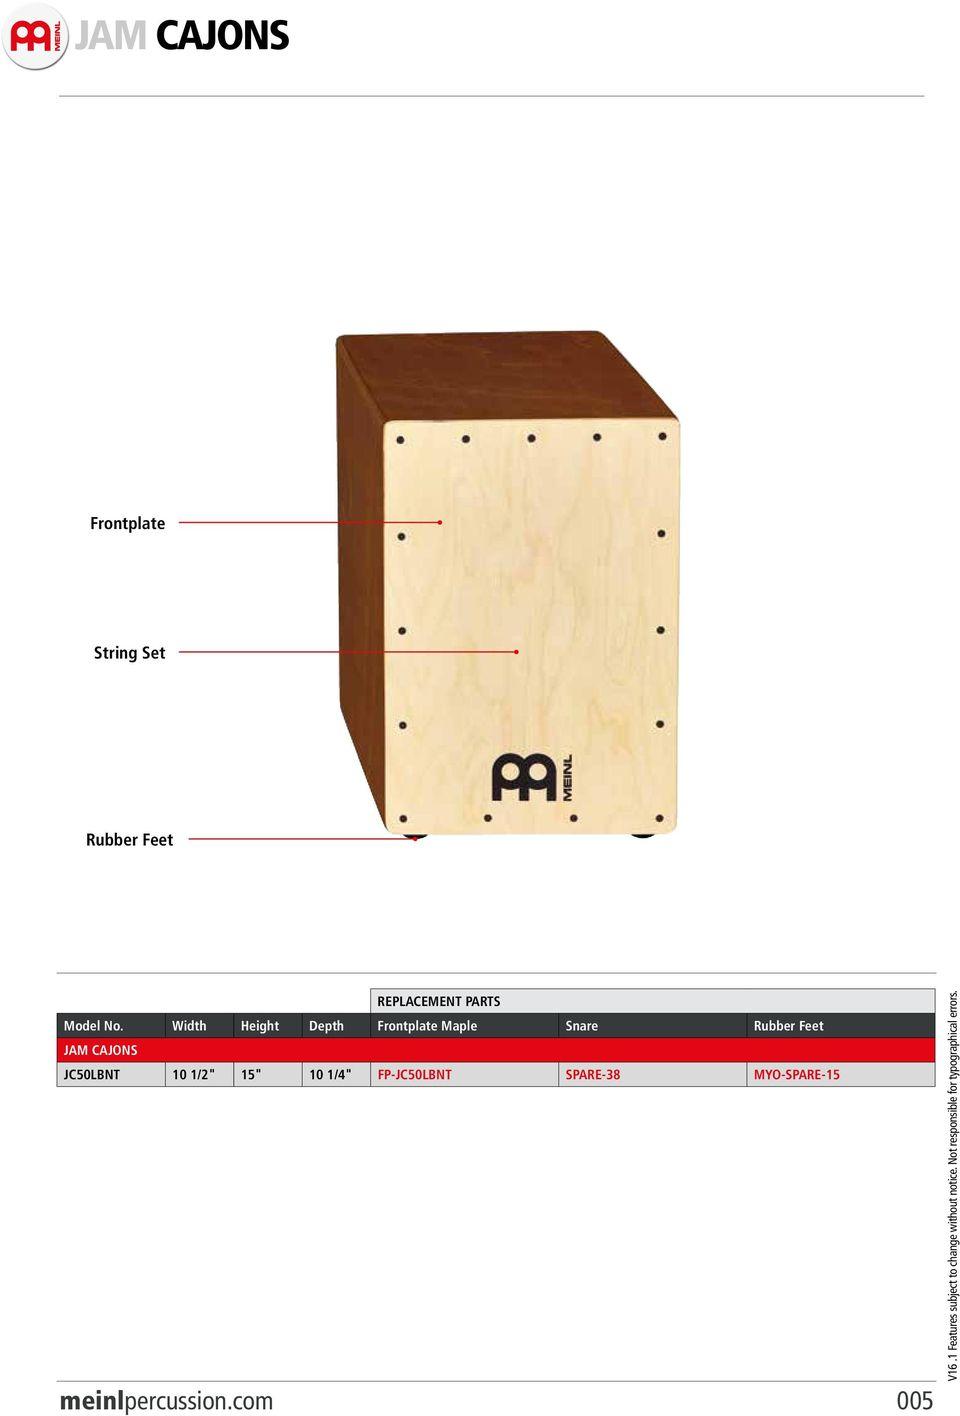 medium resolution of rubber feet jam cajons jc50lbnt 10 1 2 15 10 1 4